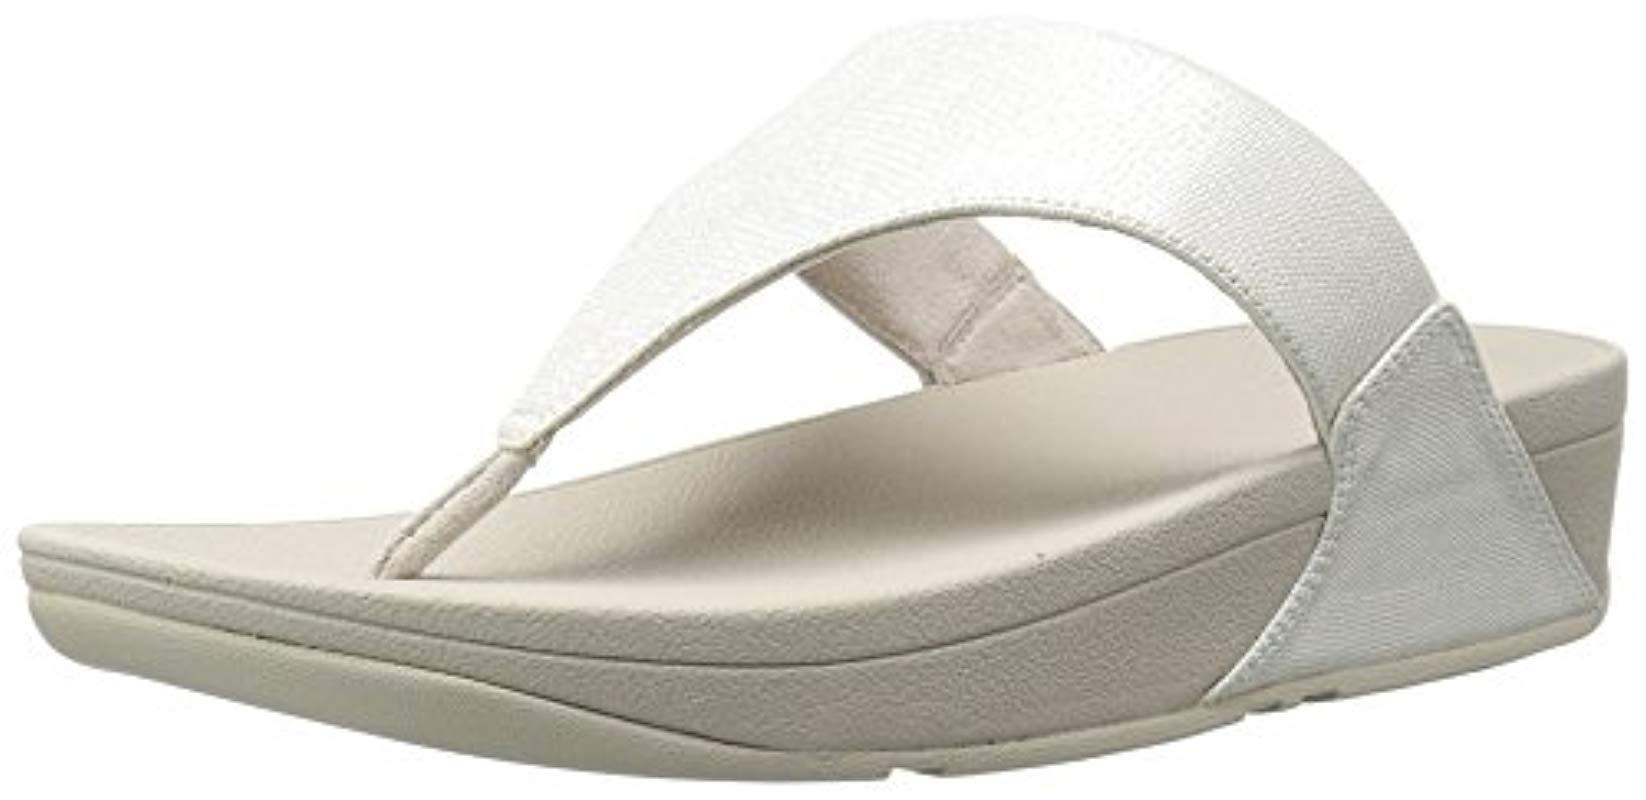 dbb8786d7 Lyst - Fitflop Lulu Lizard-print Flip Flops Sandal in Metallic